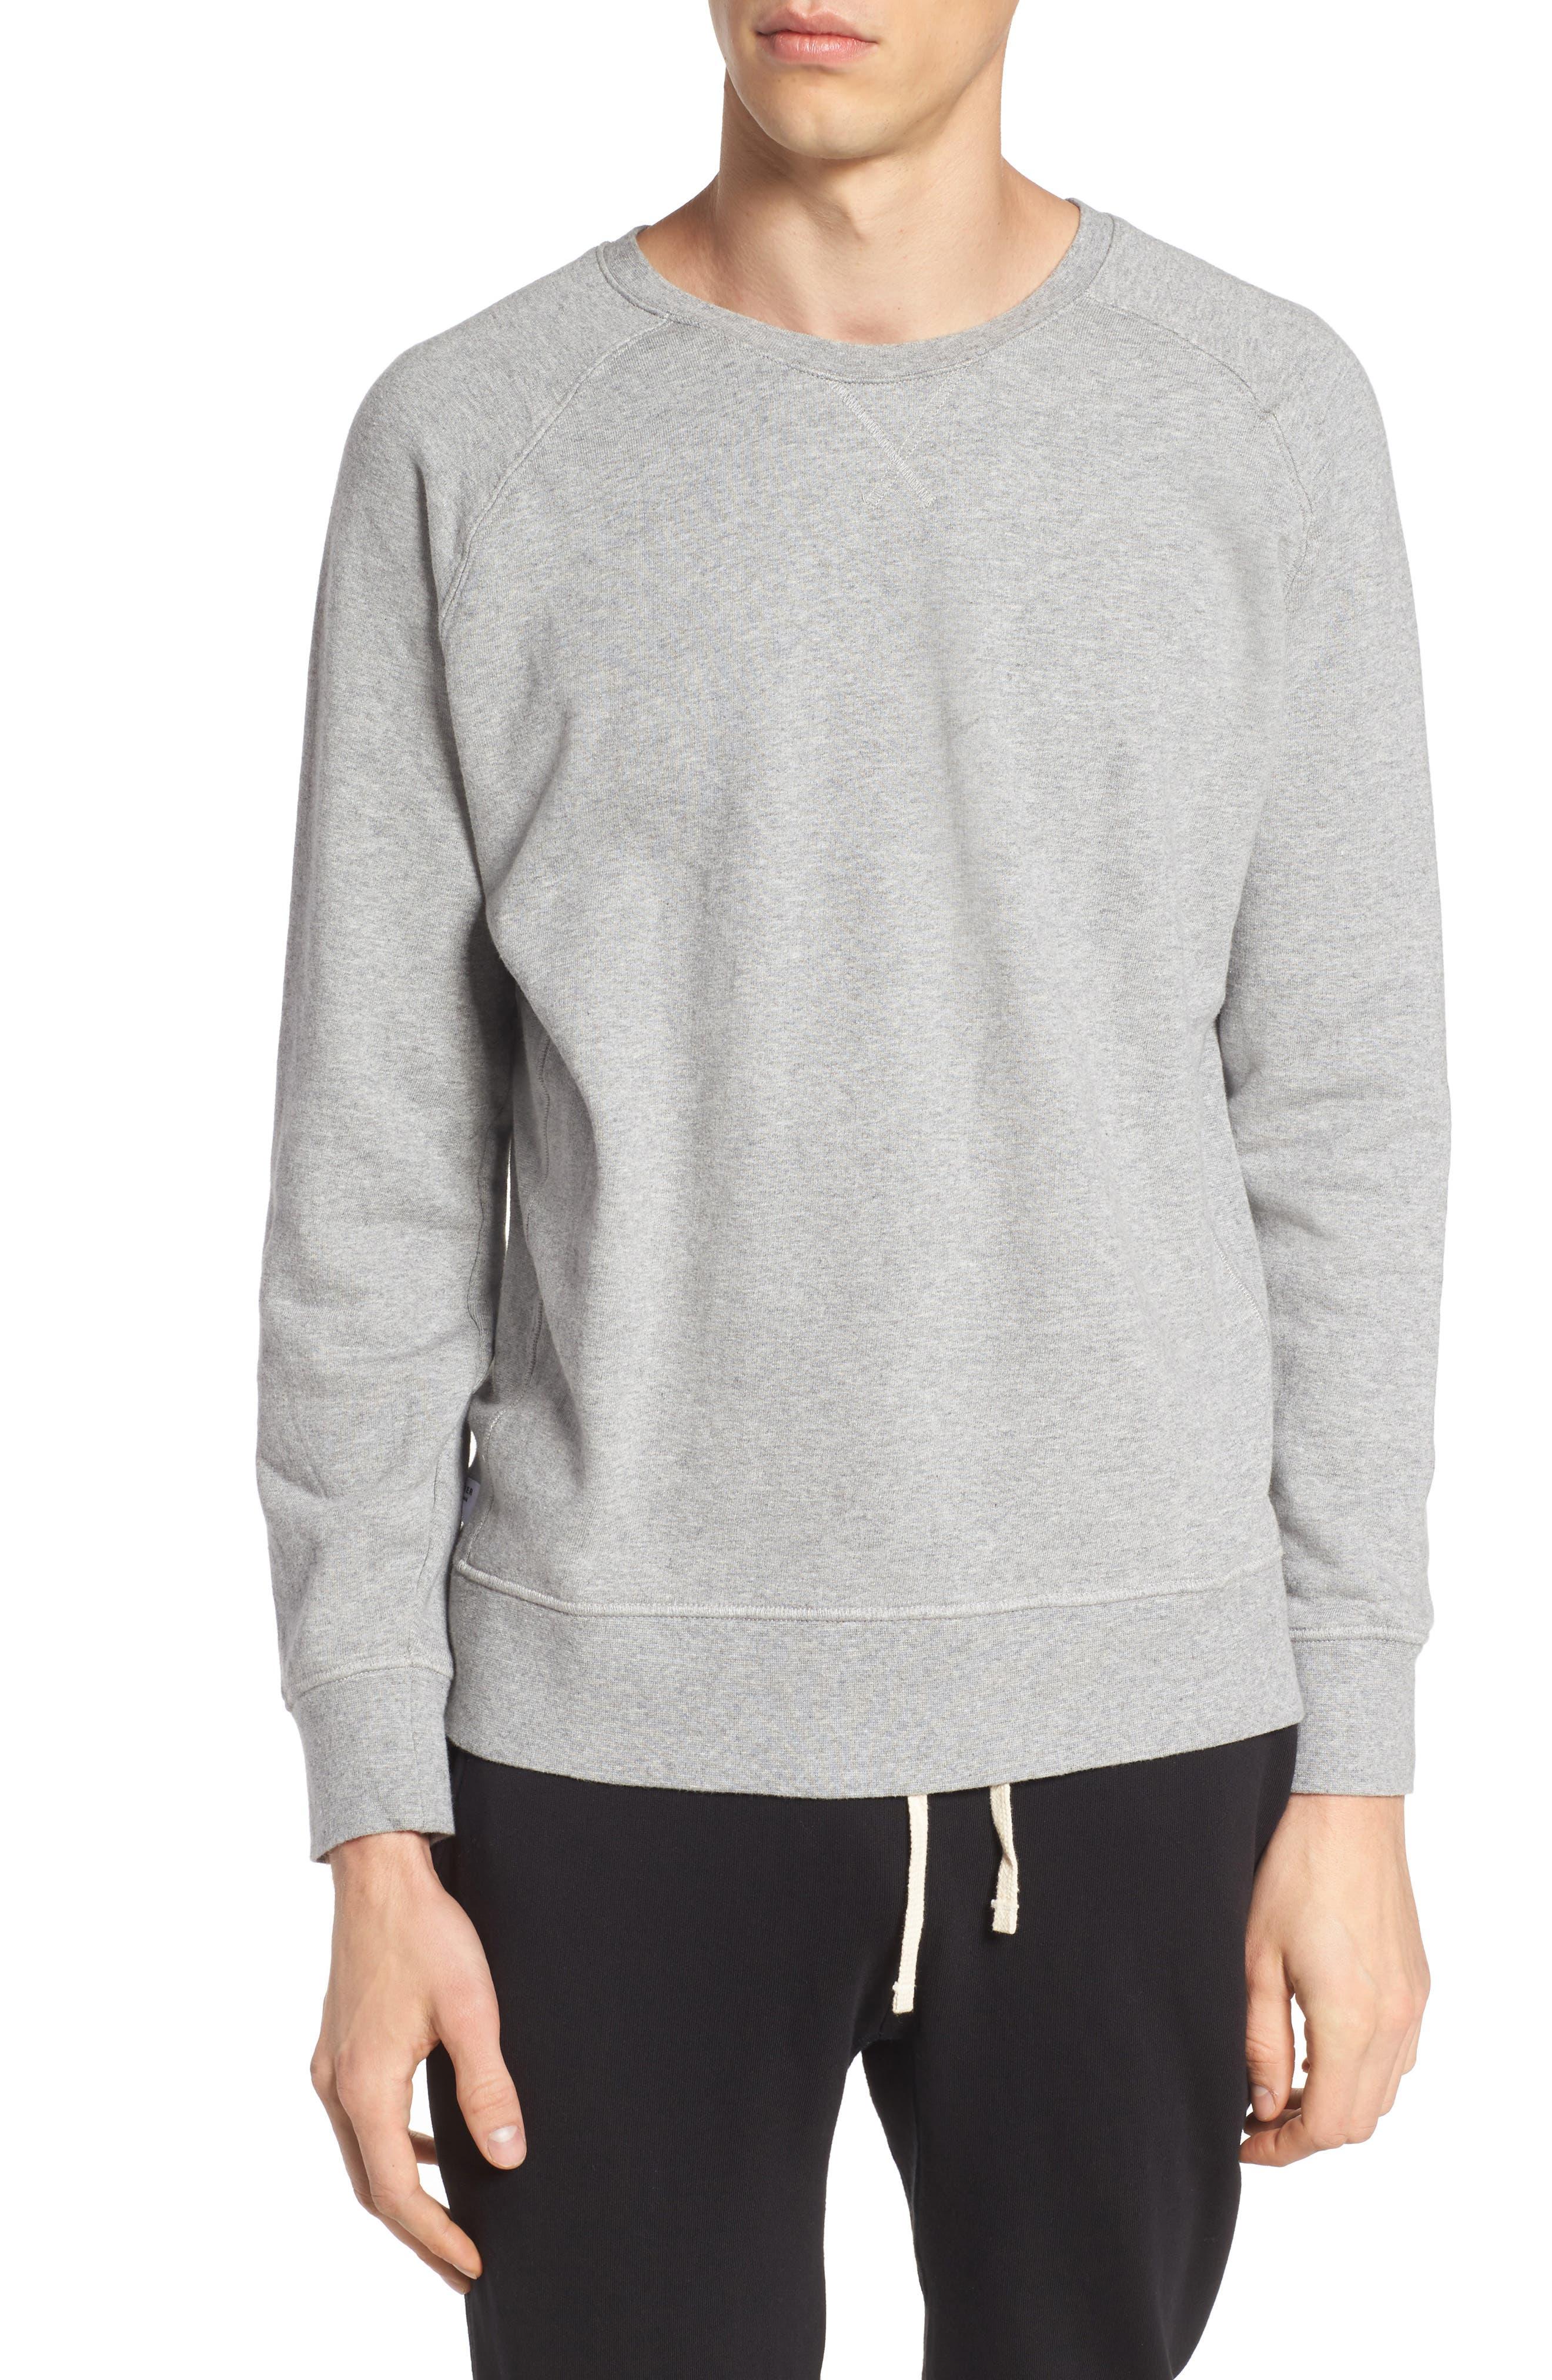 Alternate Image 1 Selected - Richer Poorer Lounge Crewneck Sweatshirt